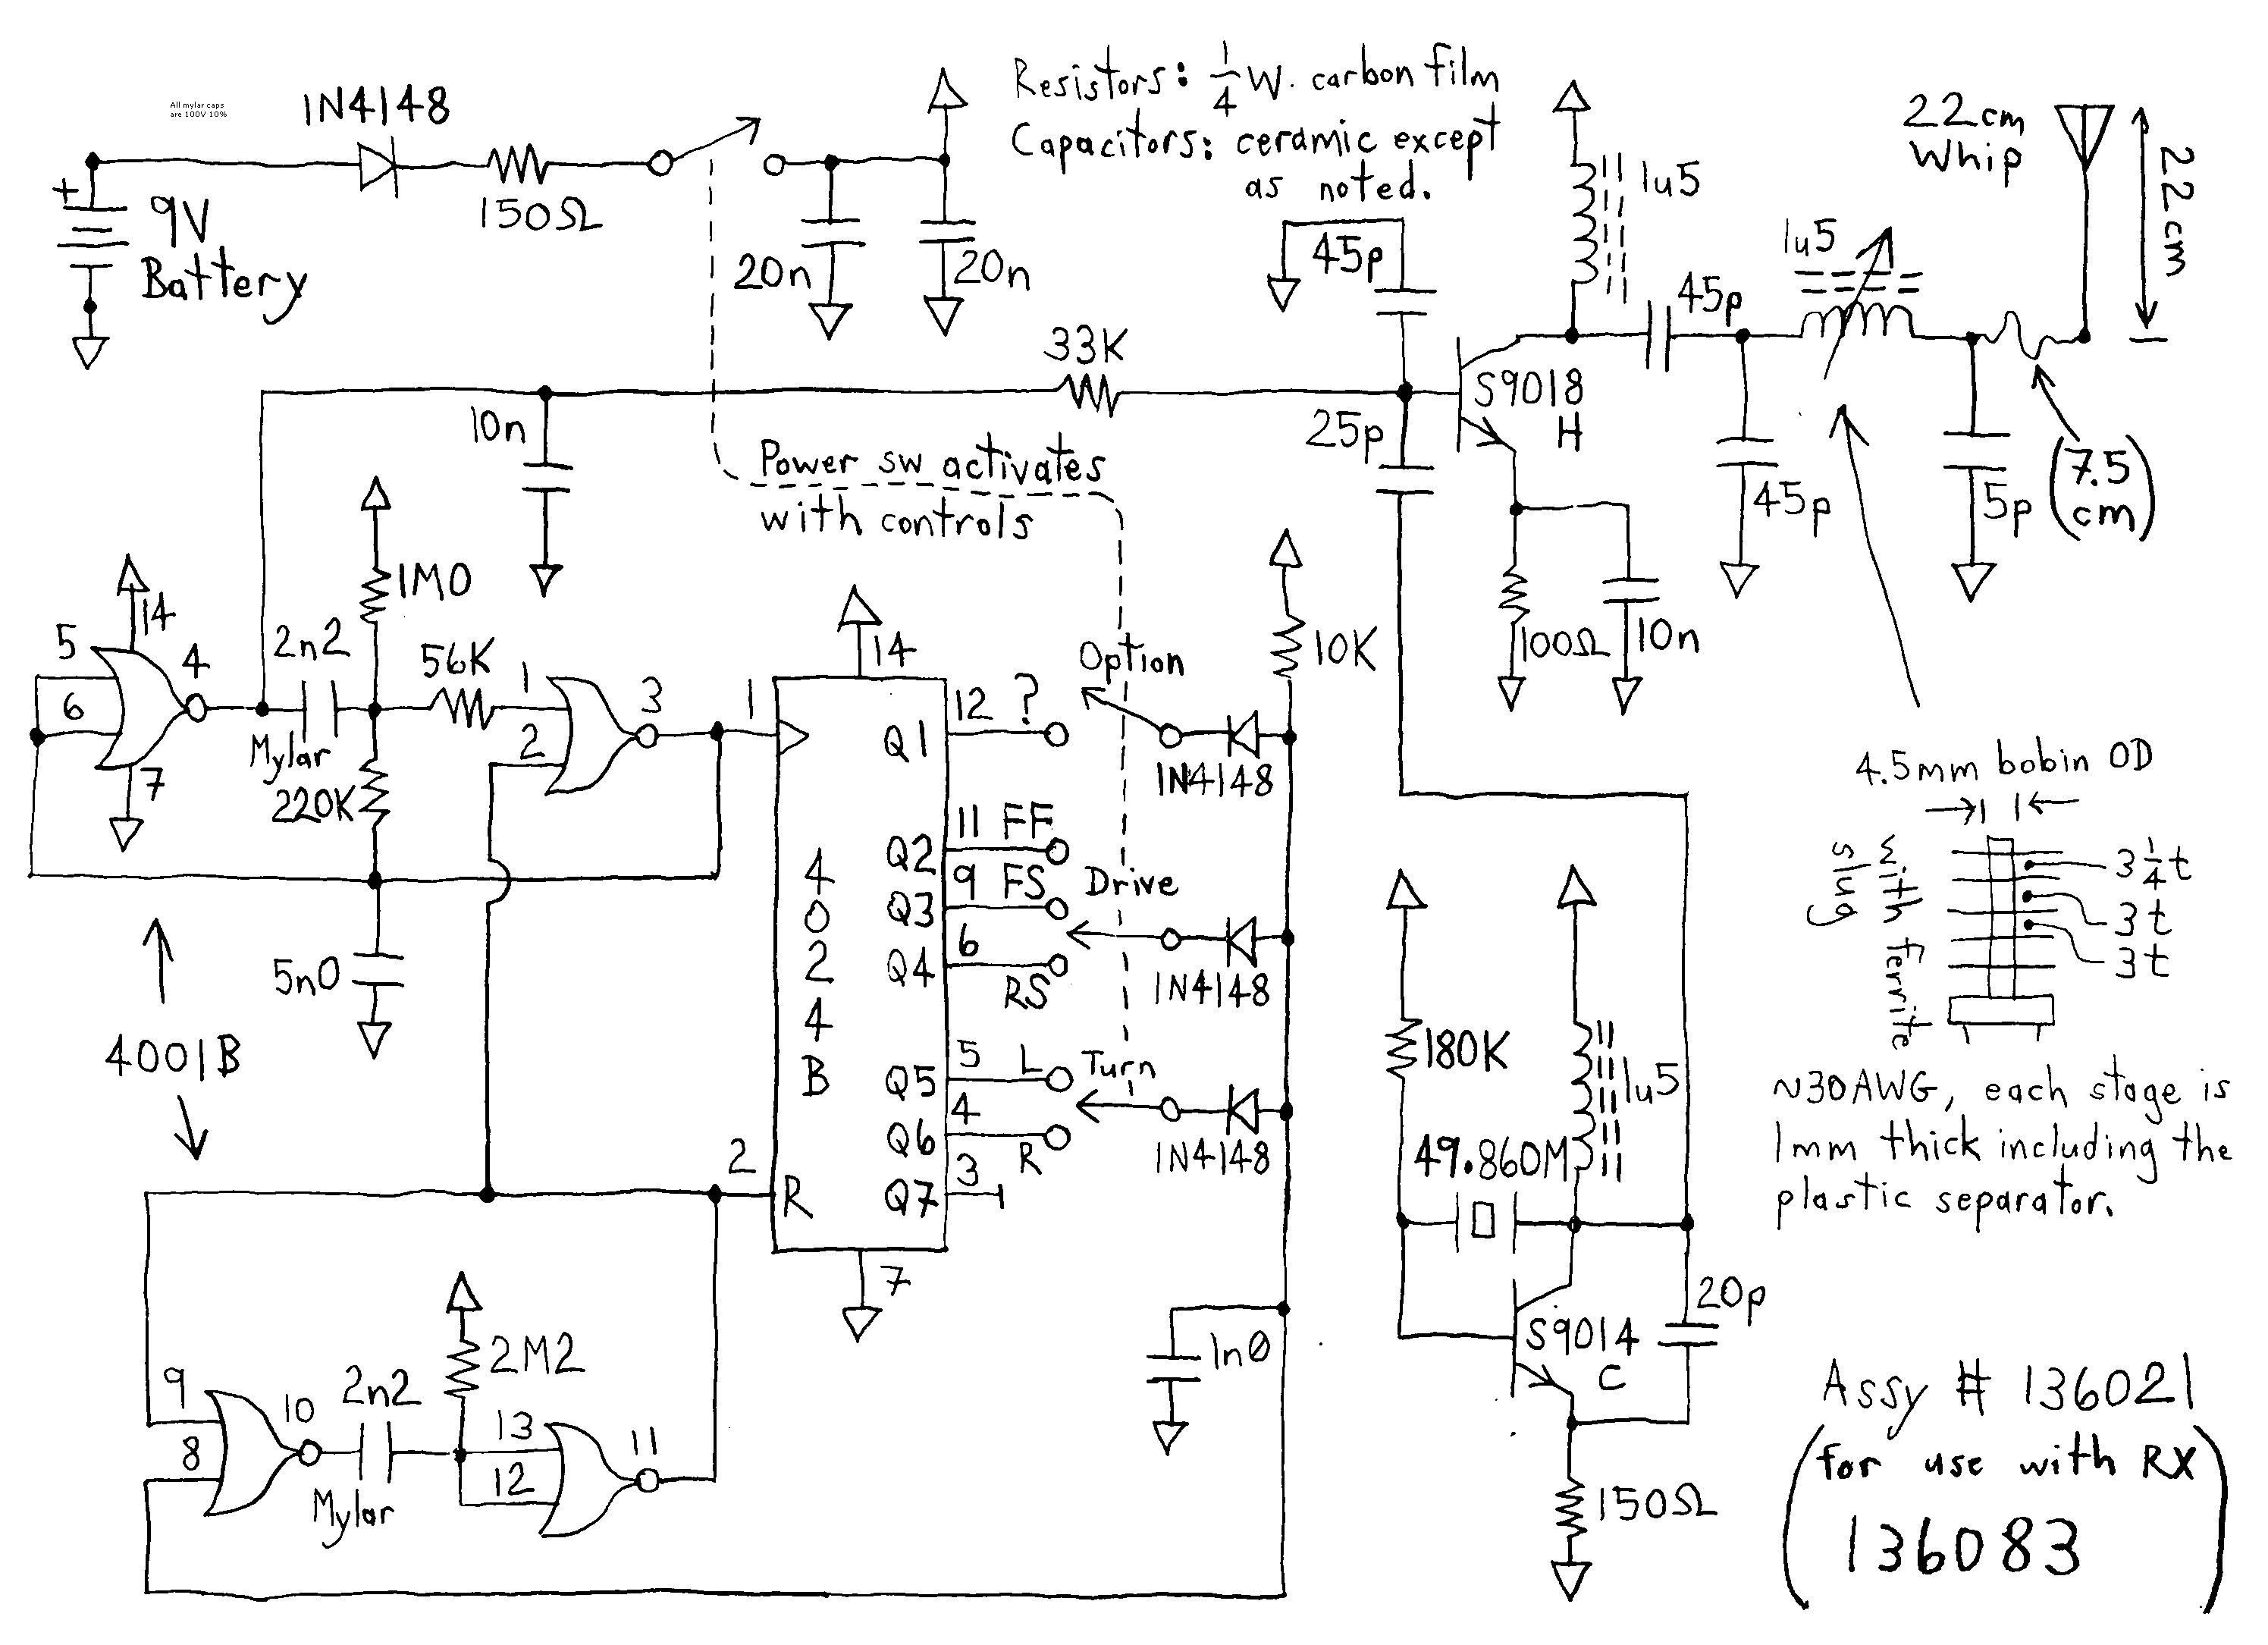 wiring diagram rc 100 automotive block diagram u2022 rh carwiringdiagram today Small Boat Wiring Guide Outboard Boat Wiring Diagram